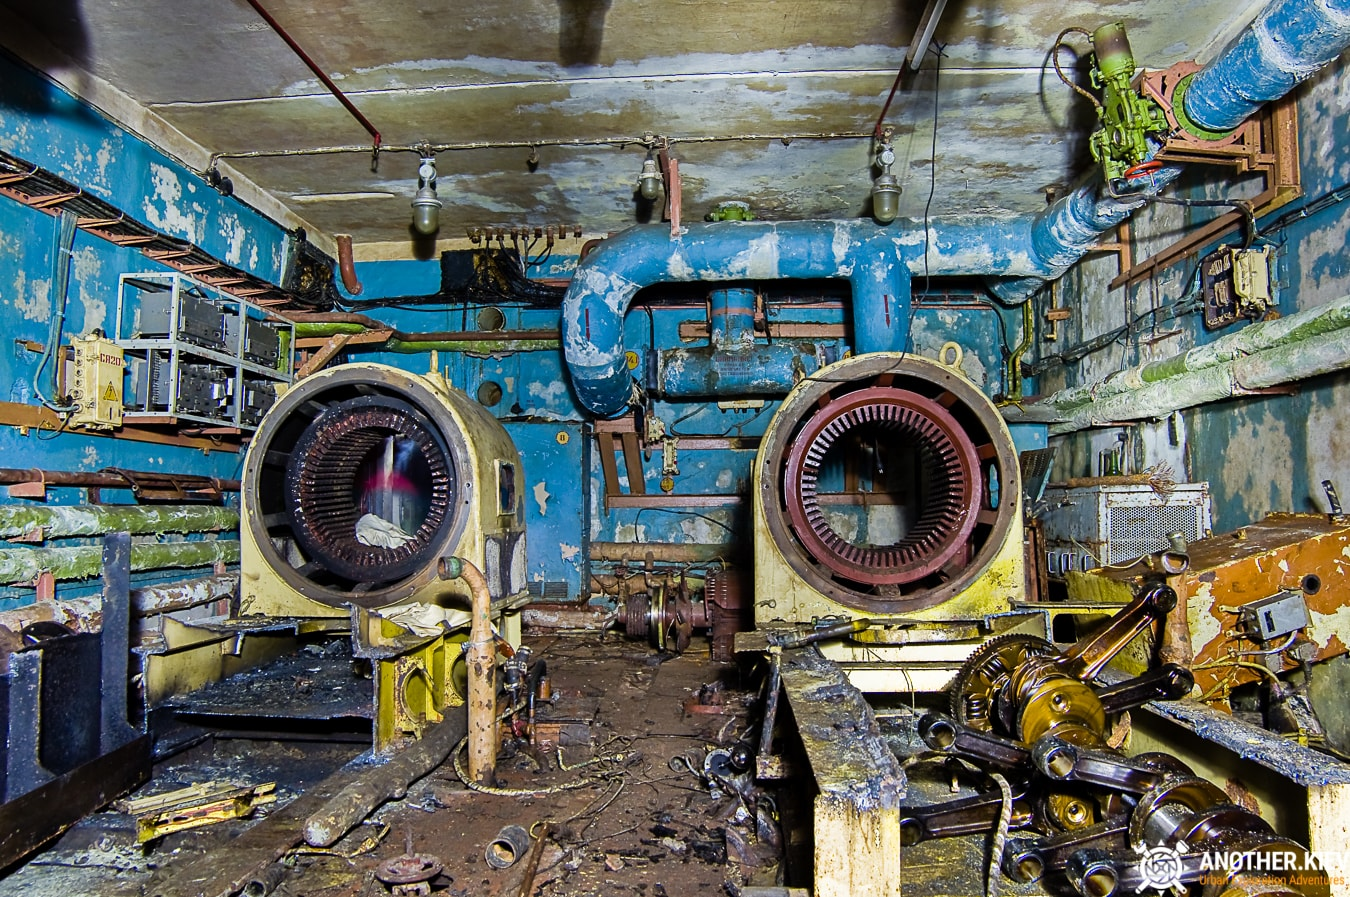 exploring-nuclear-bunker-duga-313 HIDDEN CHERNOBYL: EXPLORING NUCLEAR BUNKER  OF DUGA-3 RADAR STATION